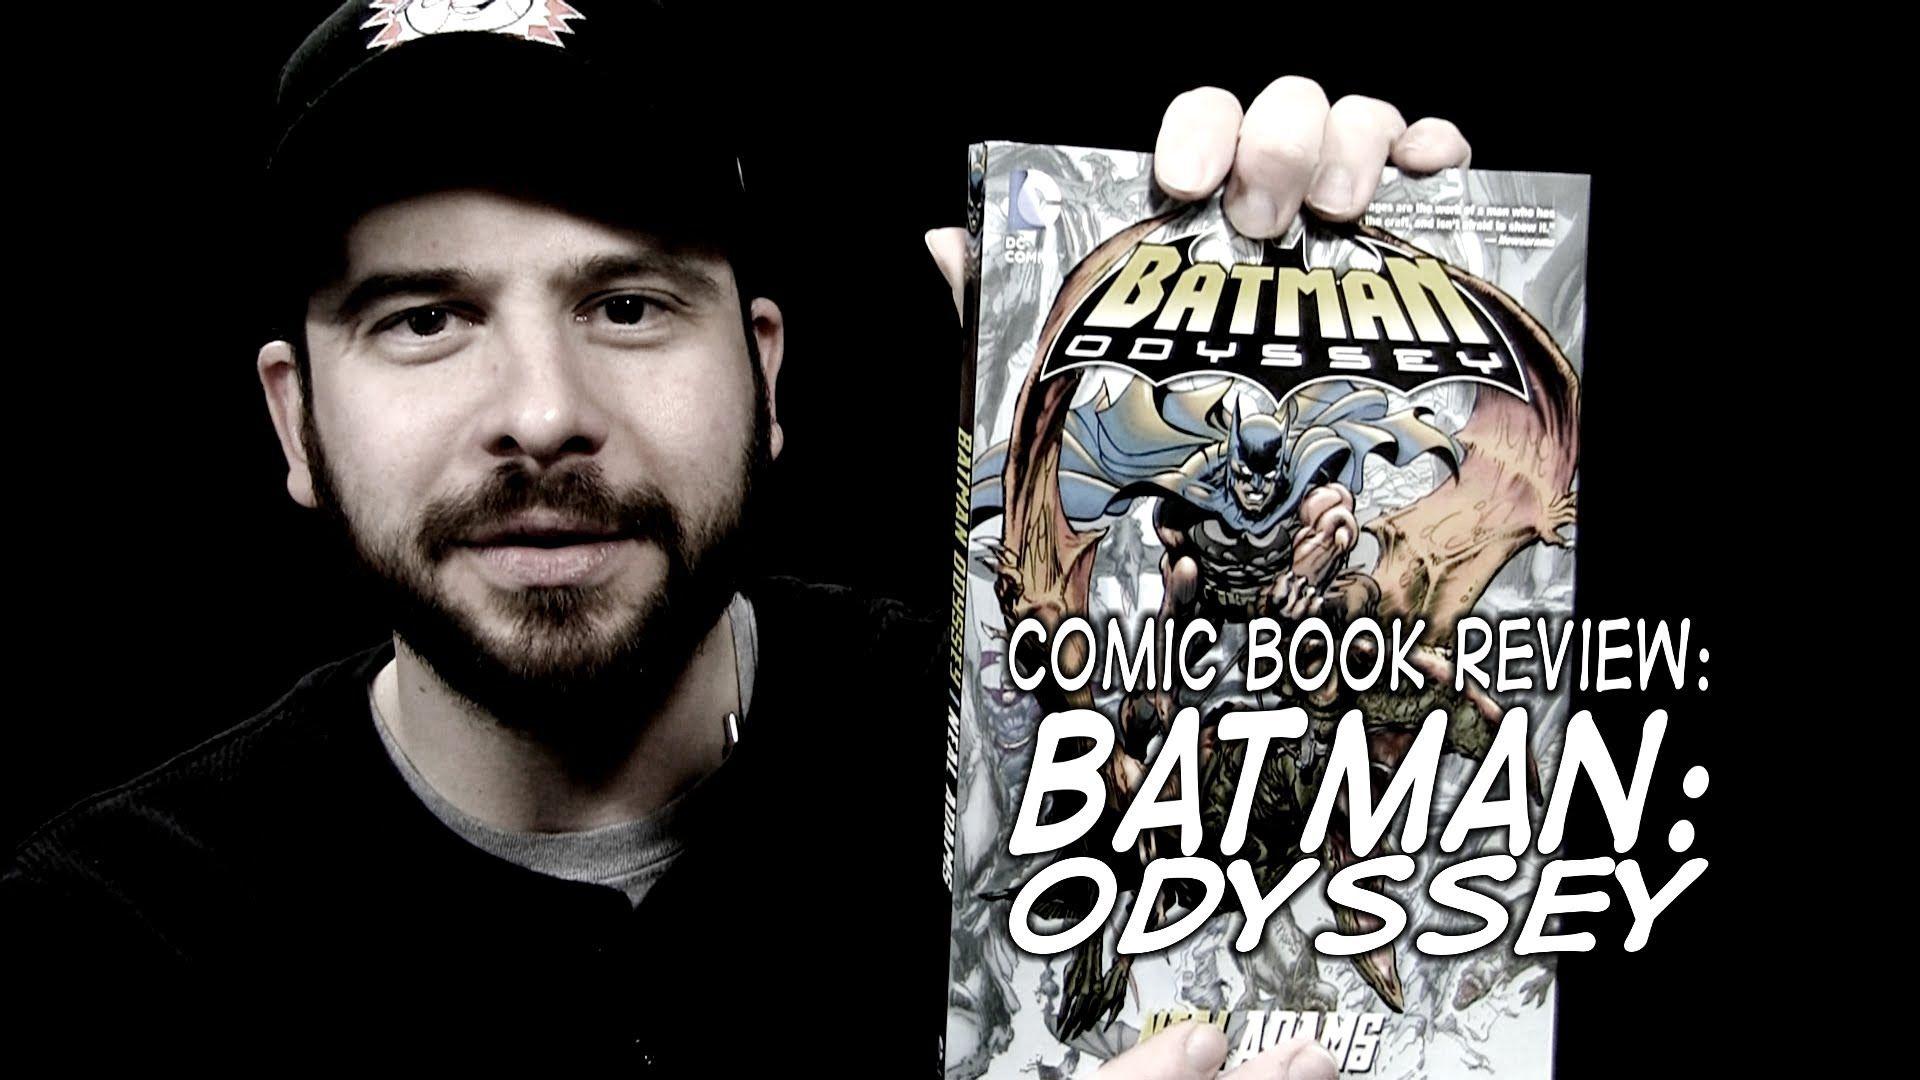 Comic Book Review: Batman: Odyssey